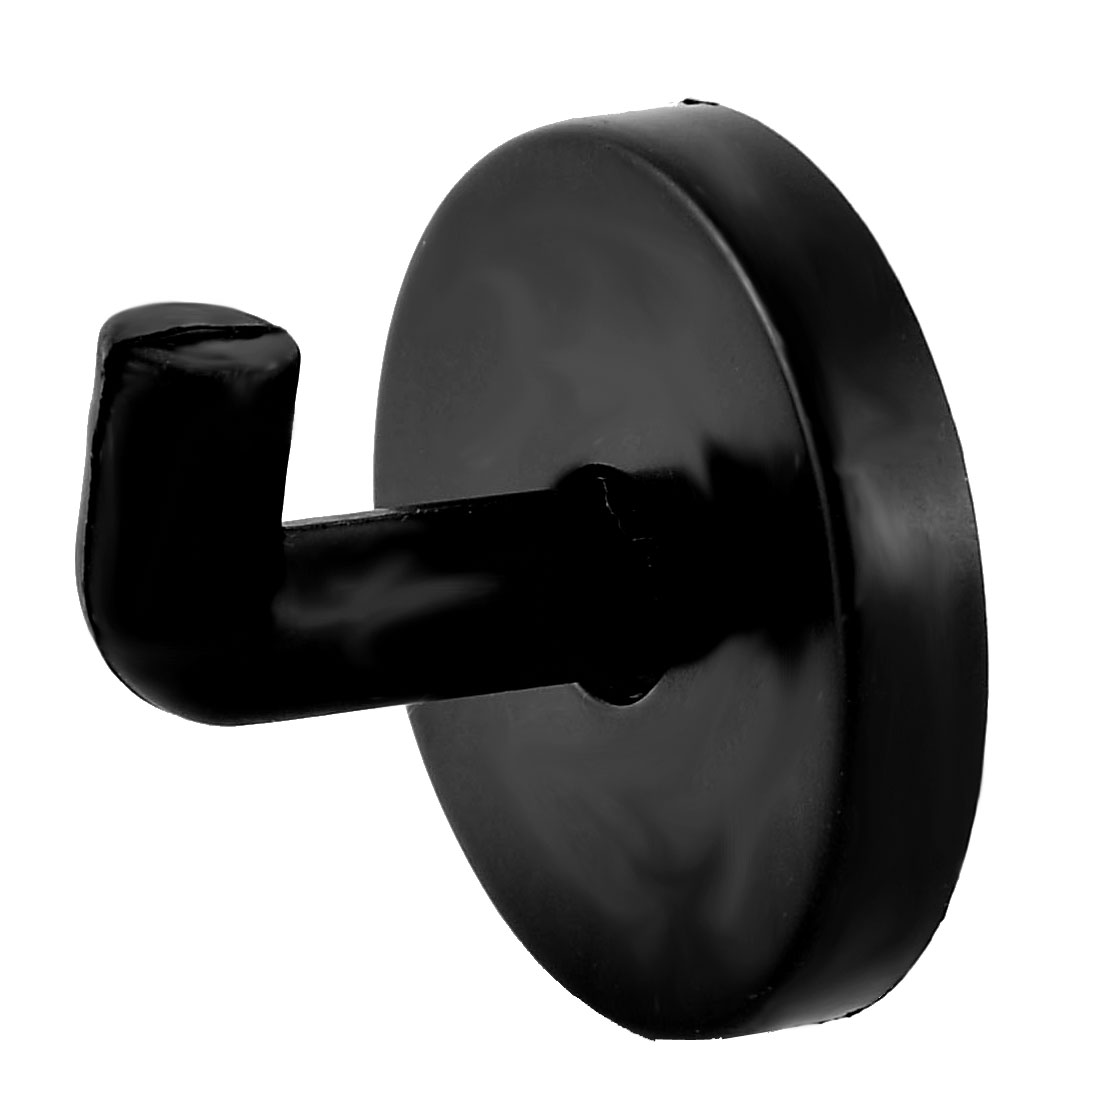 Plastic Round Bathroom Toilet Clothes Hat Coat Handbag Hook Hanger Black 4pcs - image 1 of 4